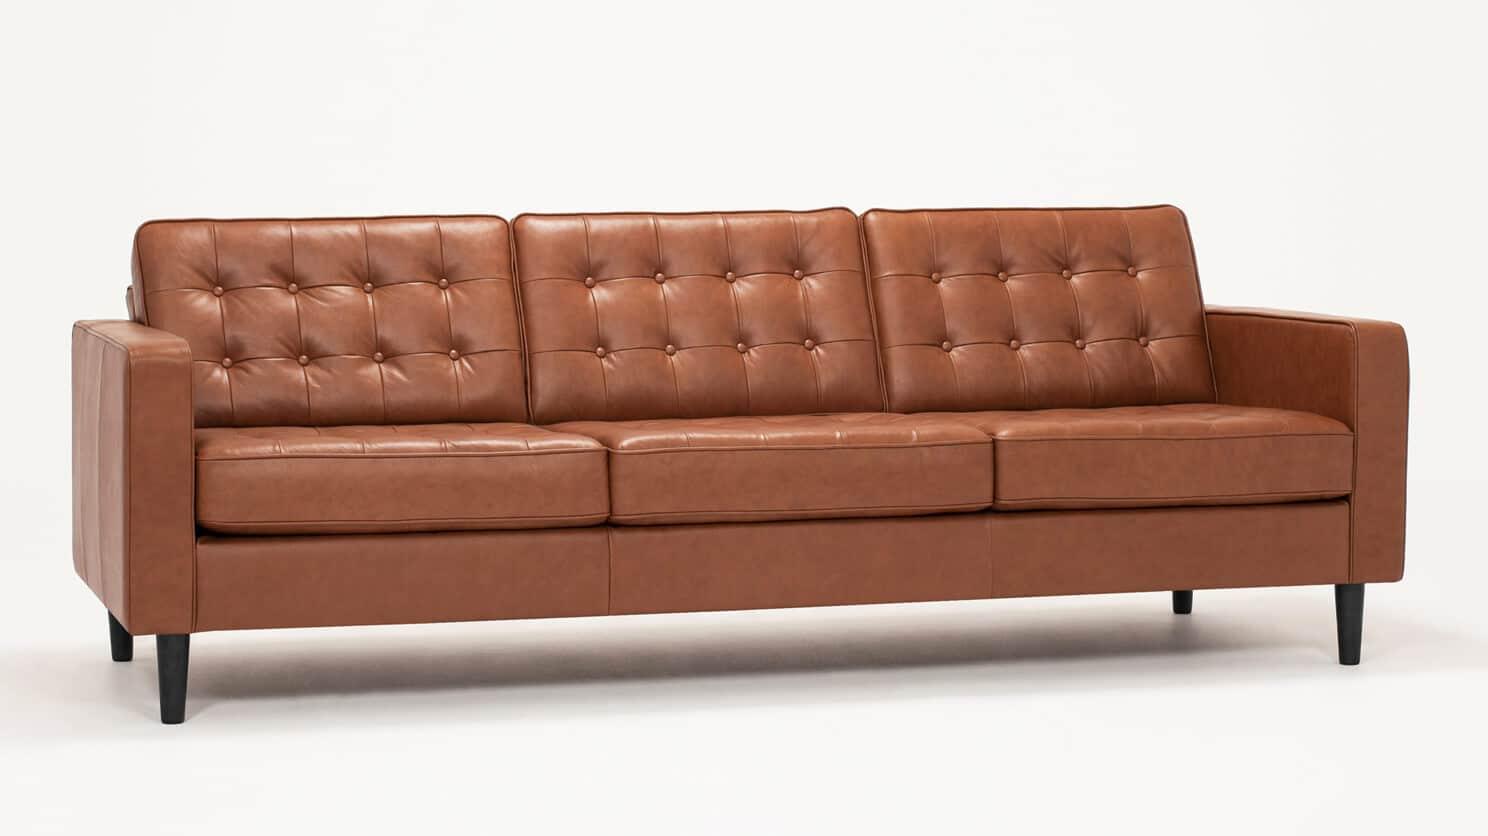 37095 s3 02 reverie 92 sofa classic sahara front angled